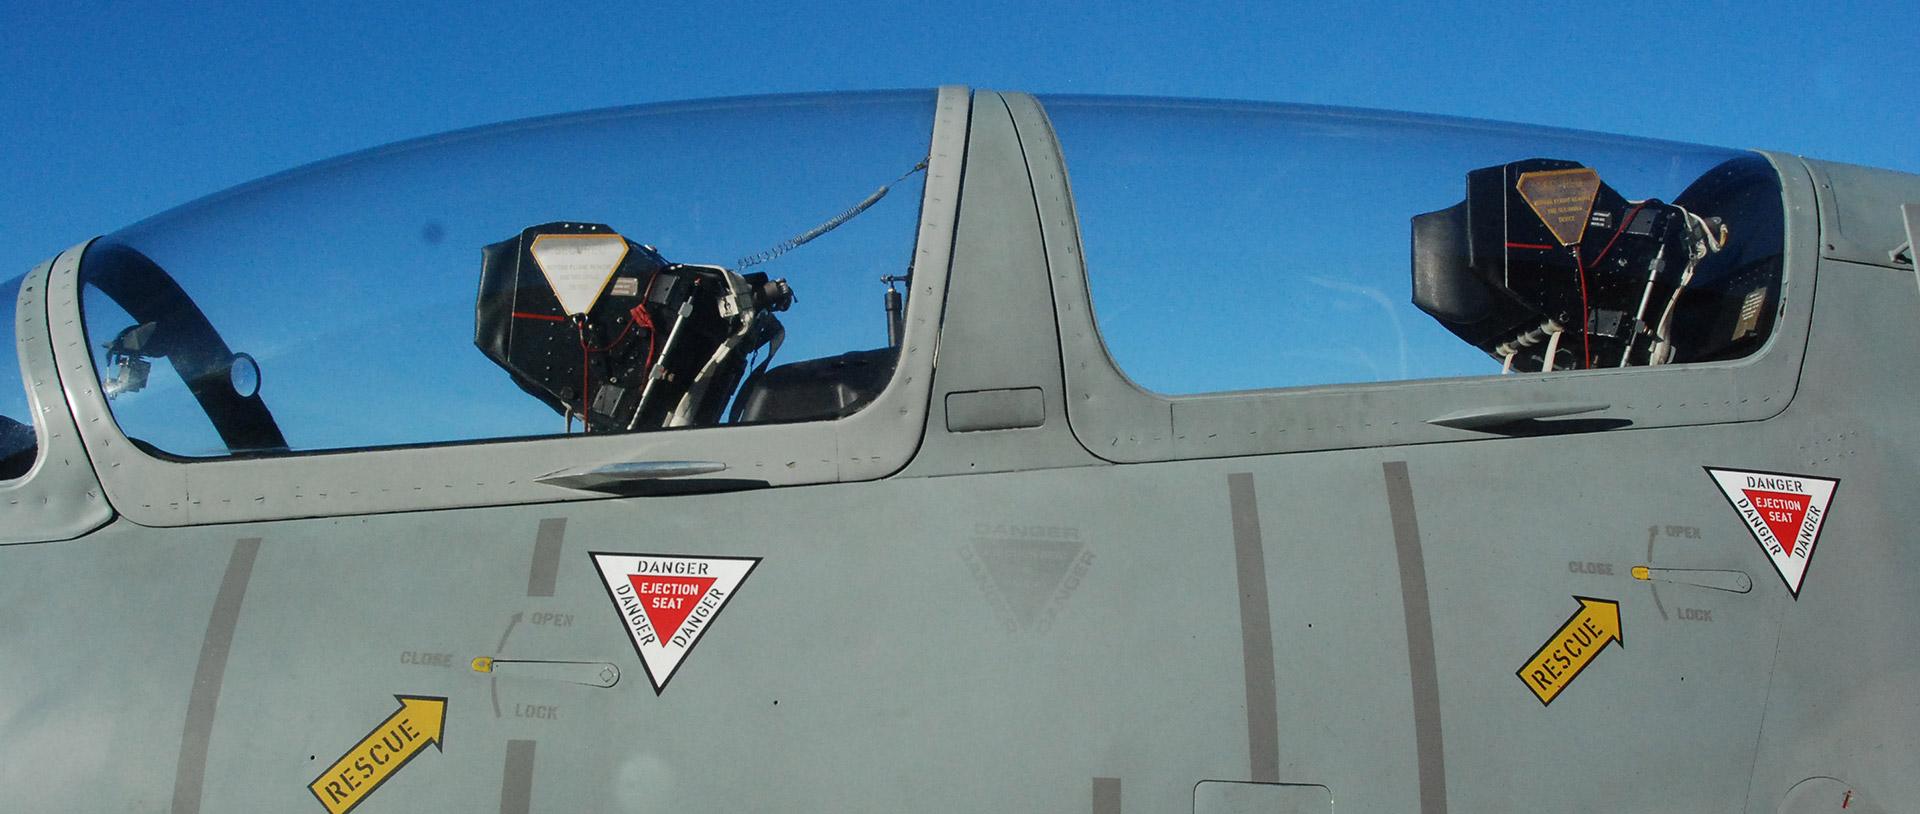 jet fighter rides uk